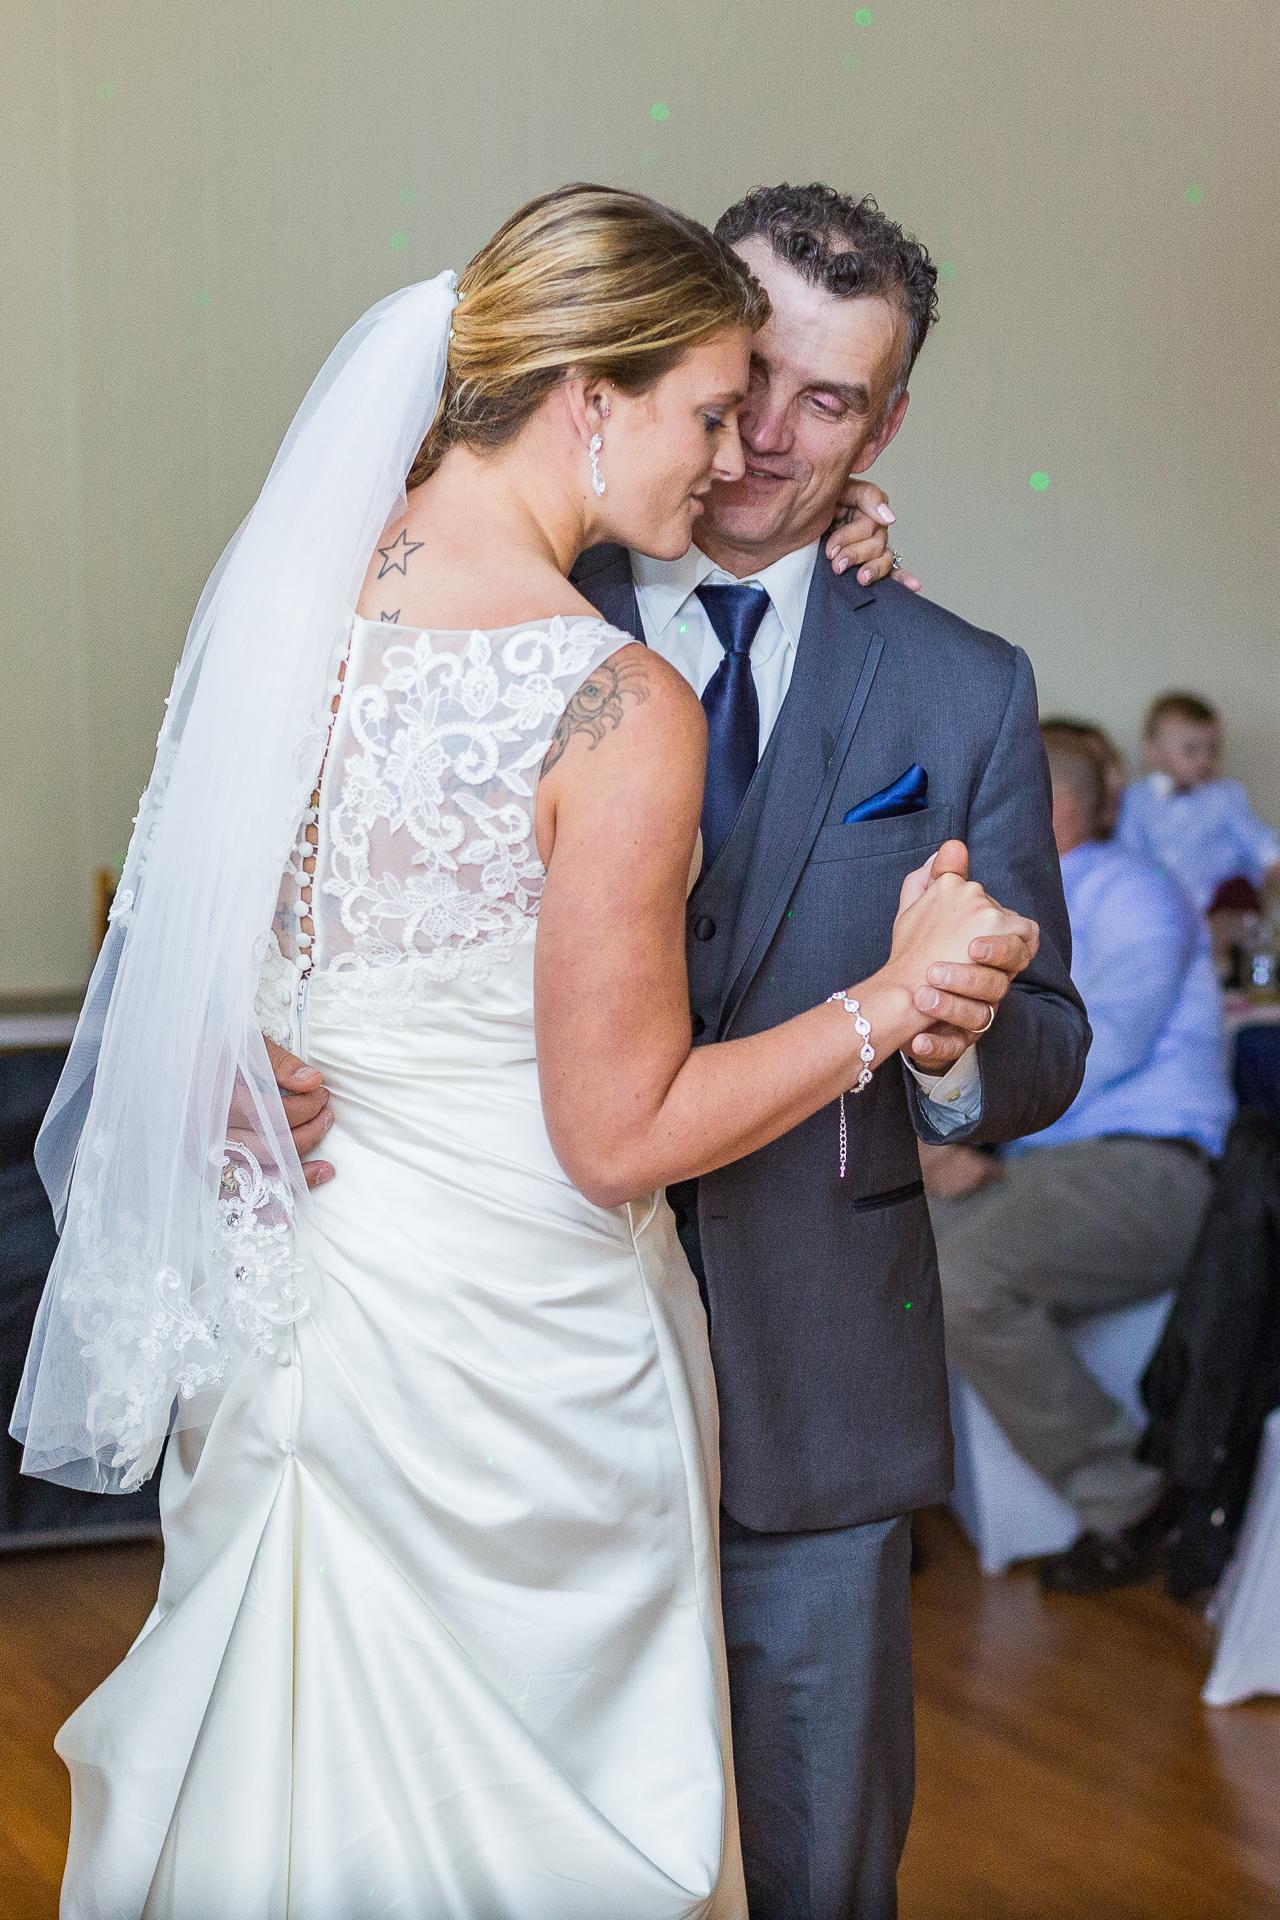 Pennsylvania October Fall Lehigh Valley wedding and lifestyle photographer Lytle Photo Co (149 of 167).jpg